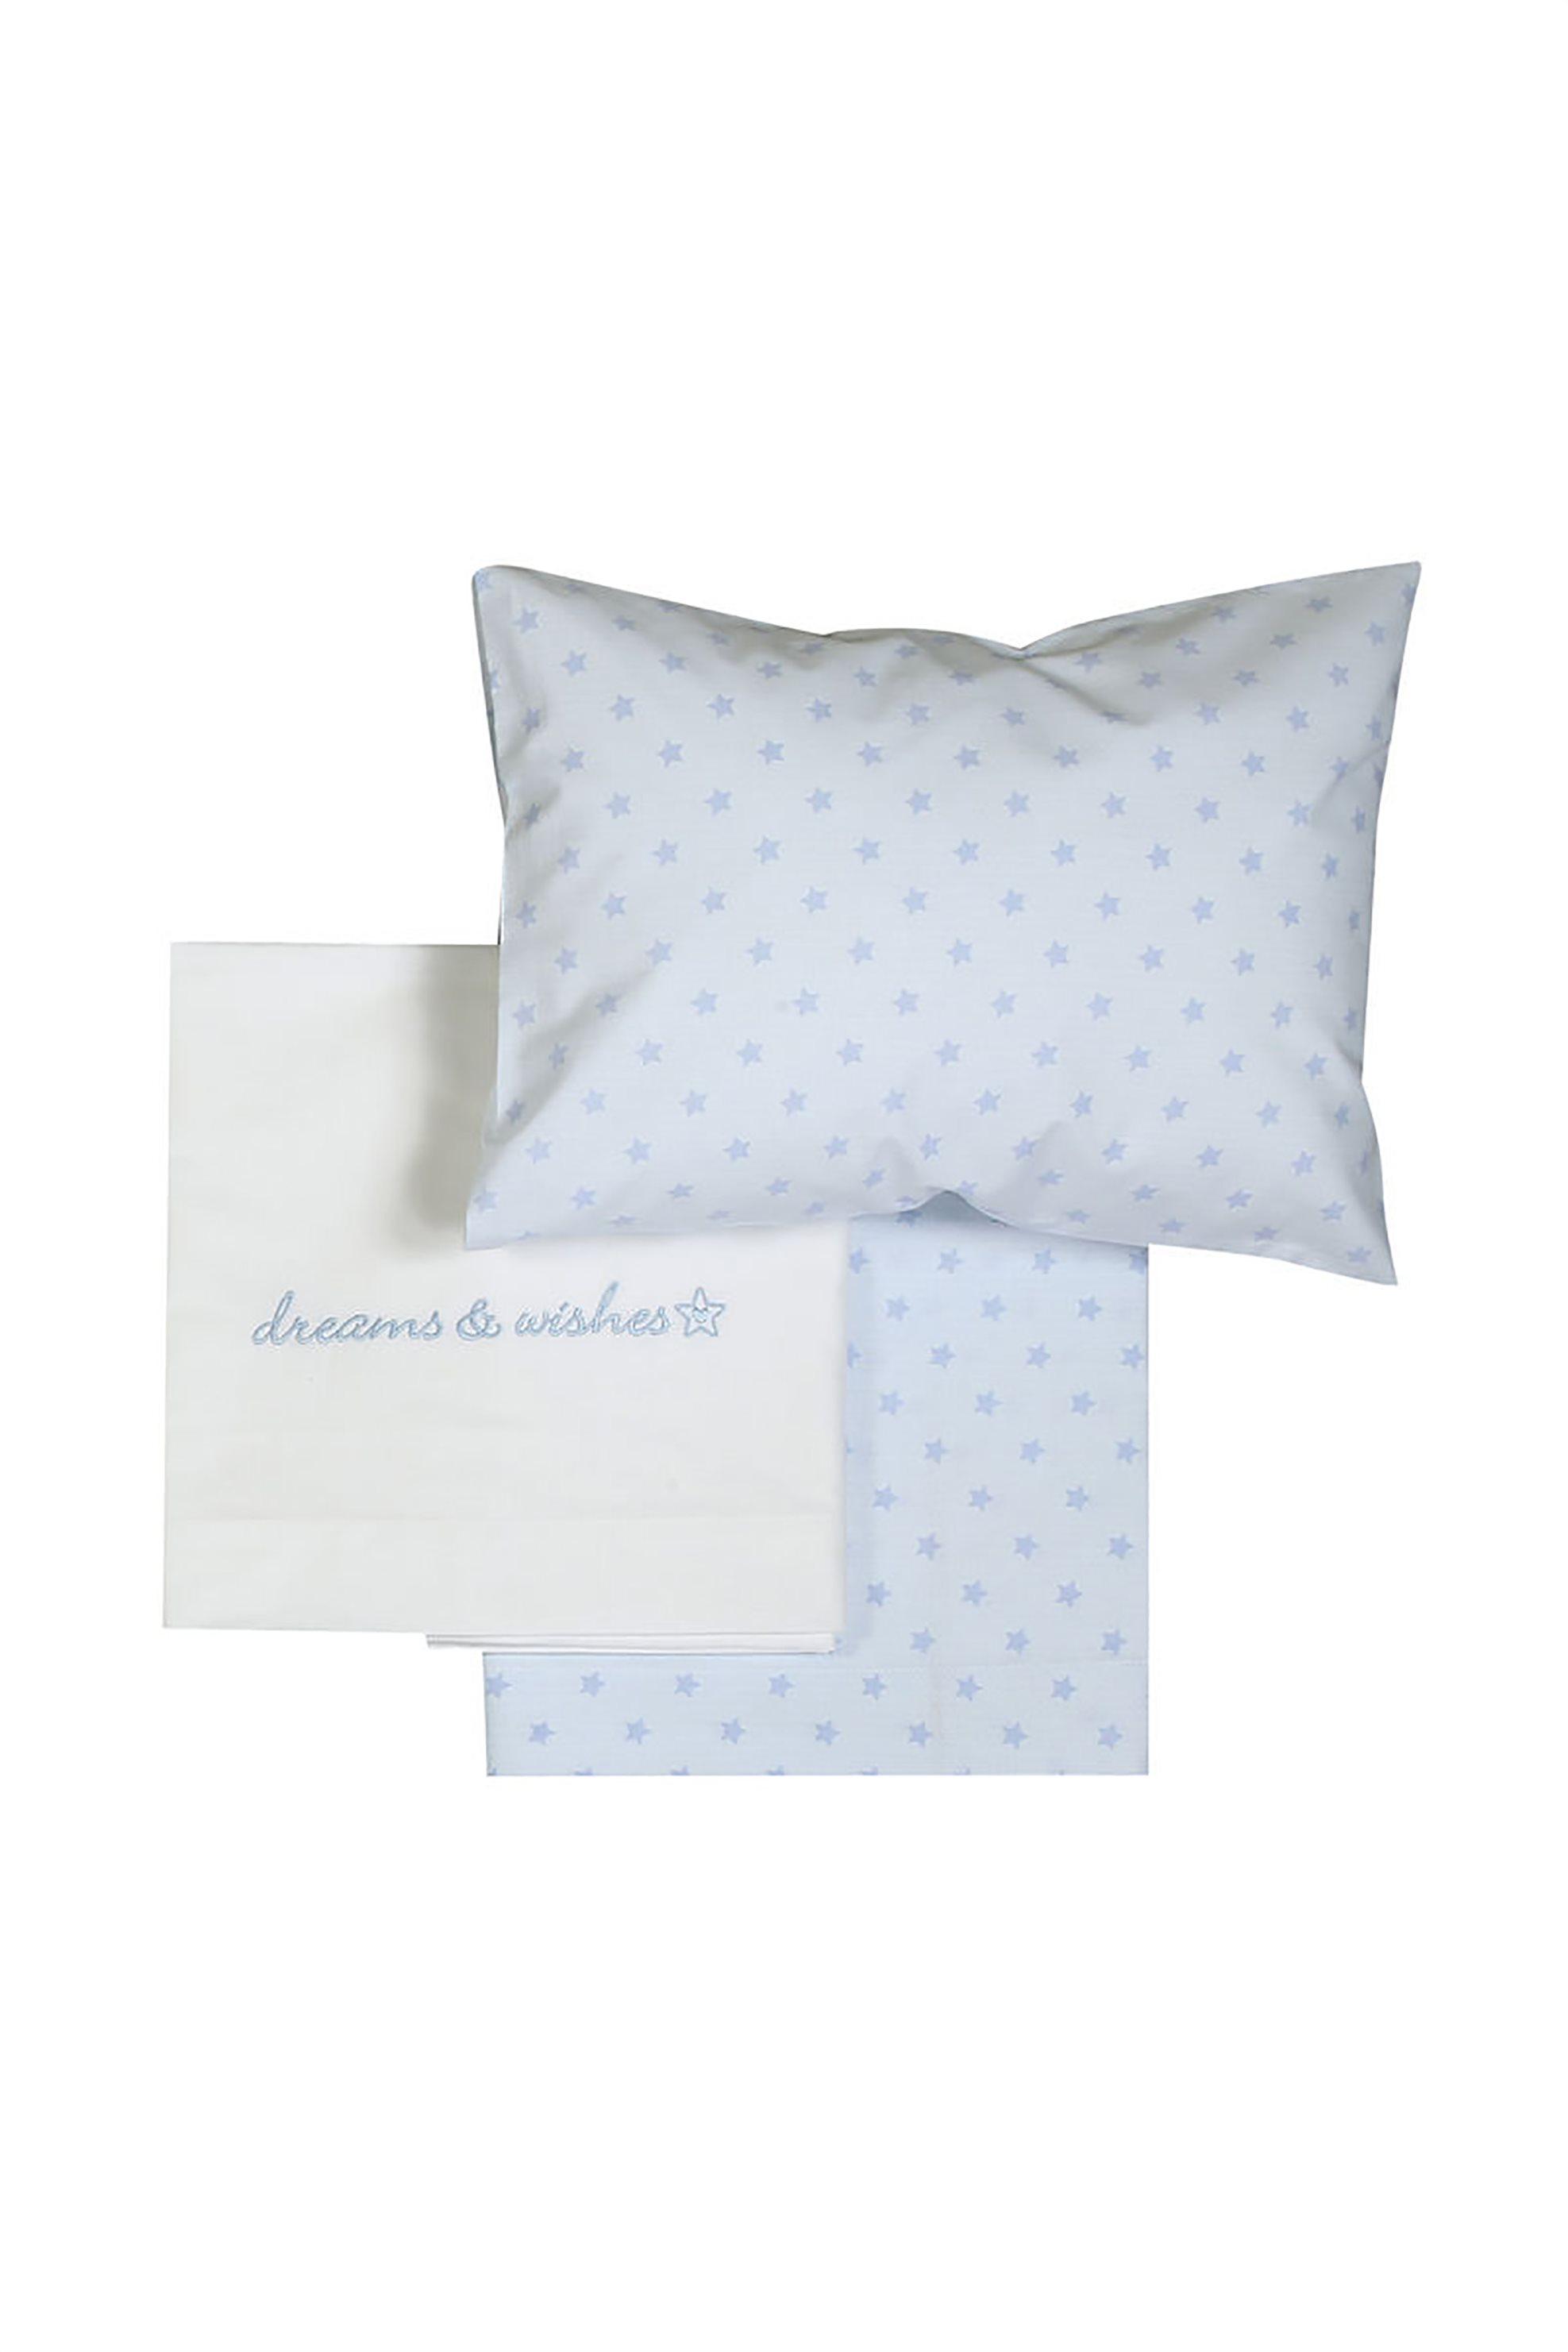 NEF-NEF Σετ σεντόνια κούνιας Dream & Wishes (3 τεμάχια) - 021423 - Γαλάζιο home   παιδια   σεντόνια   σετ παιδικά σεντόνια